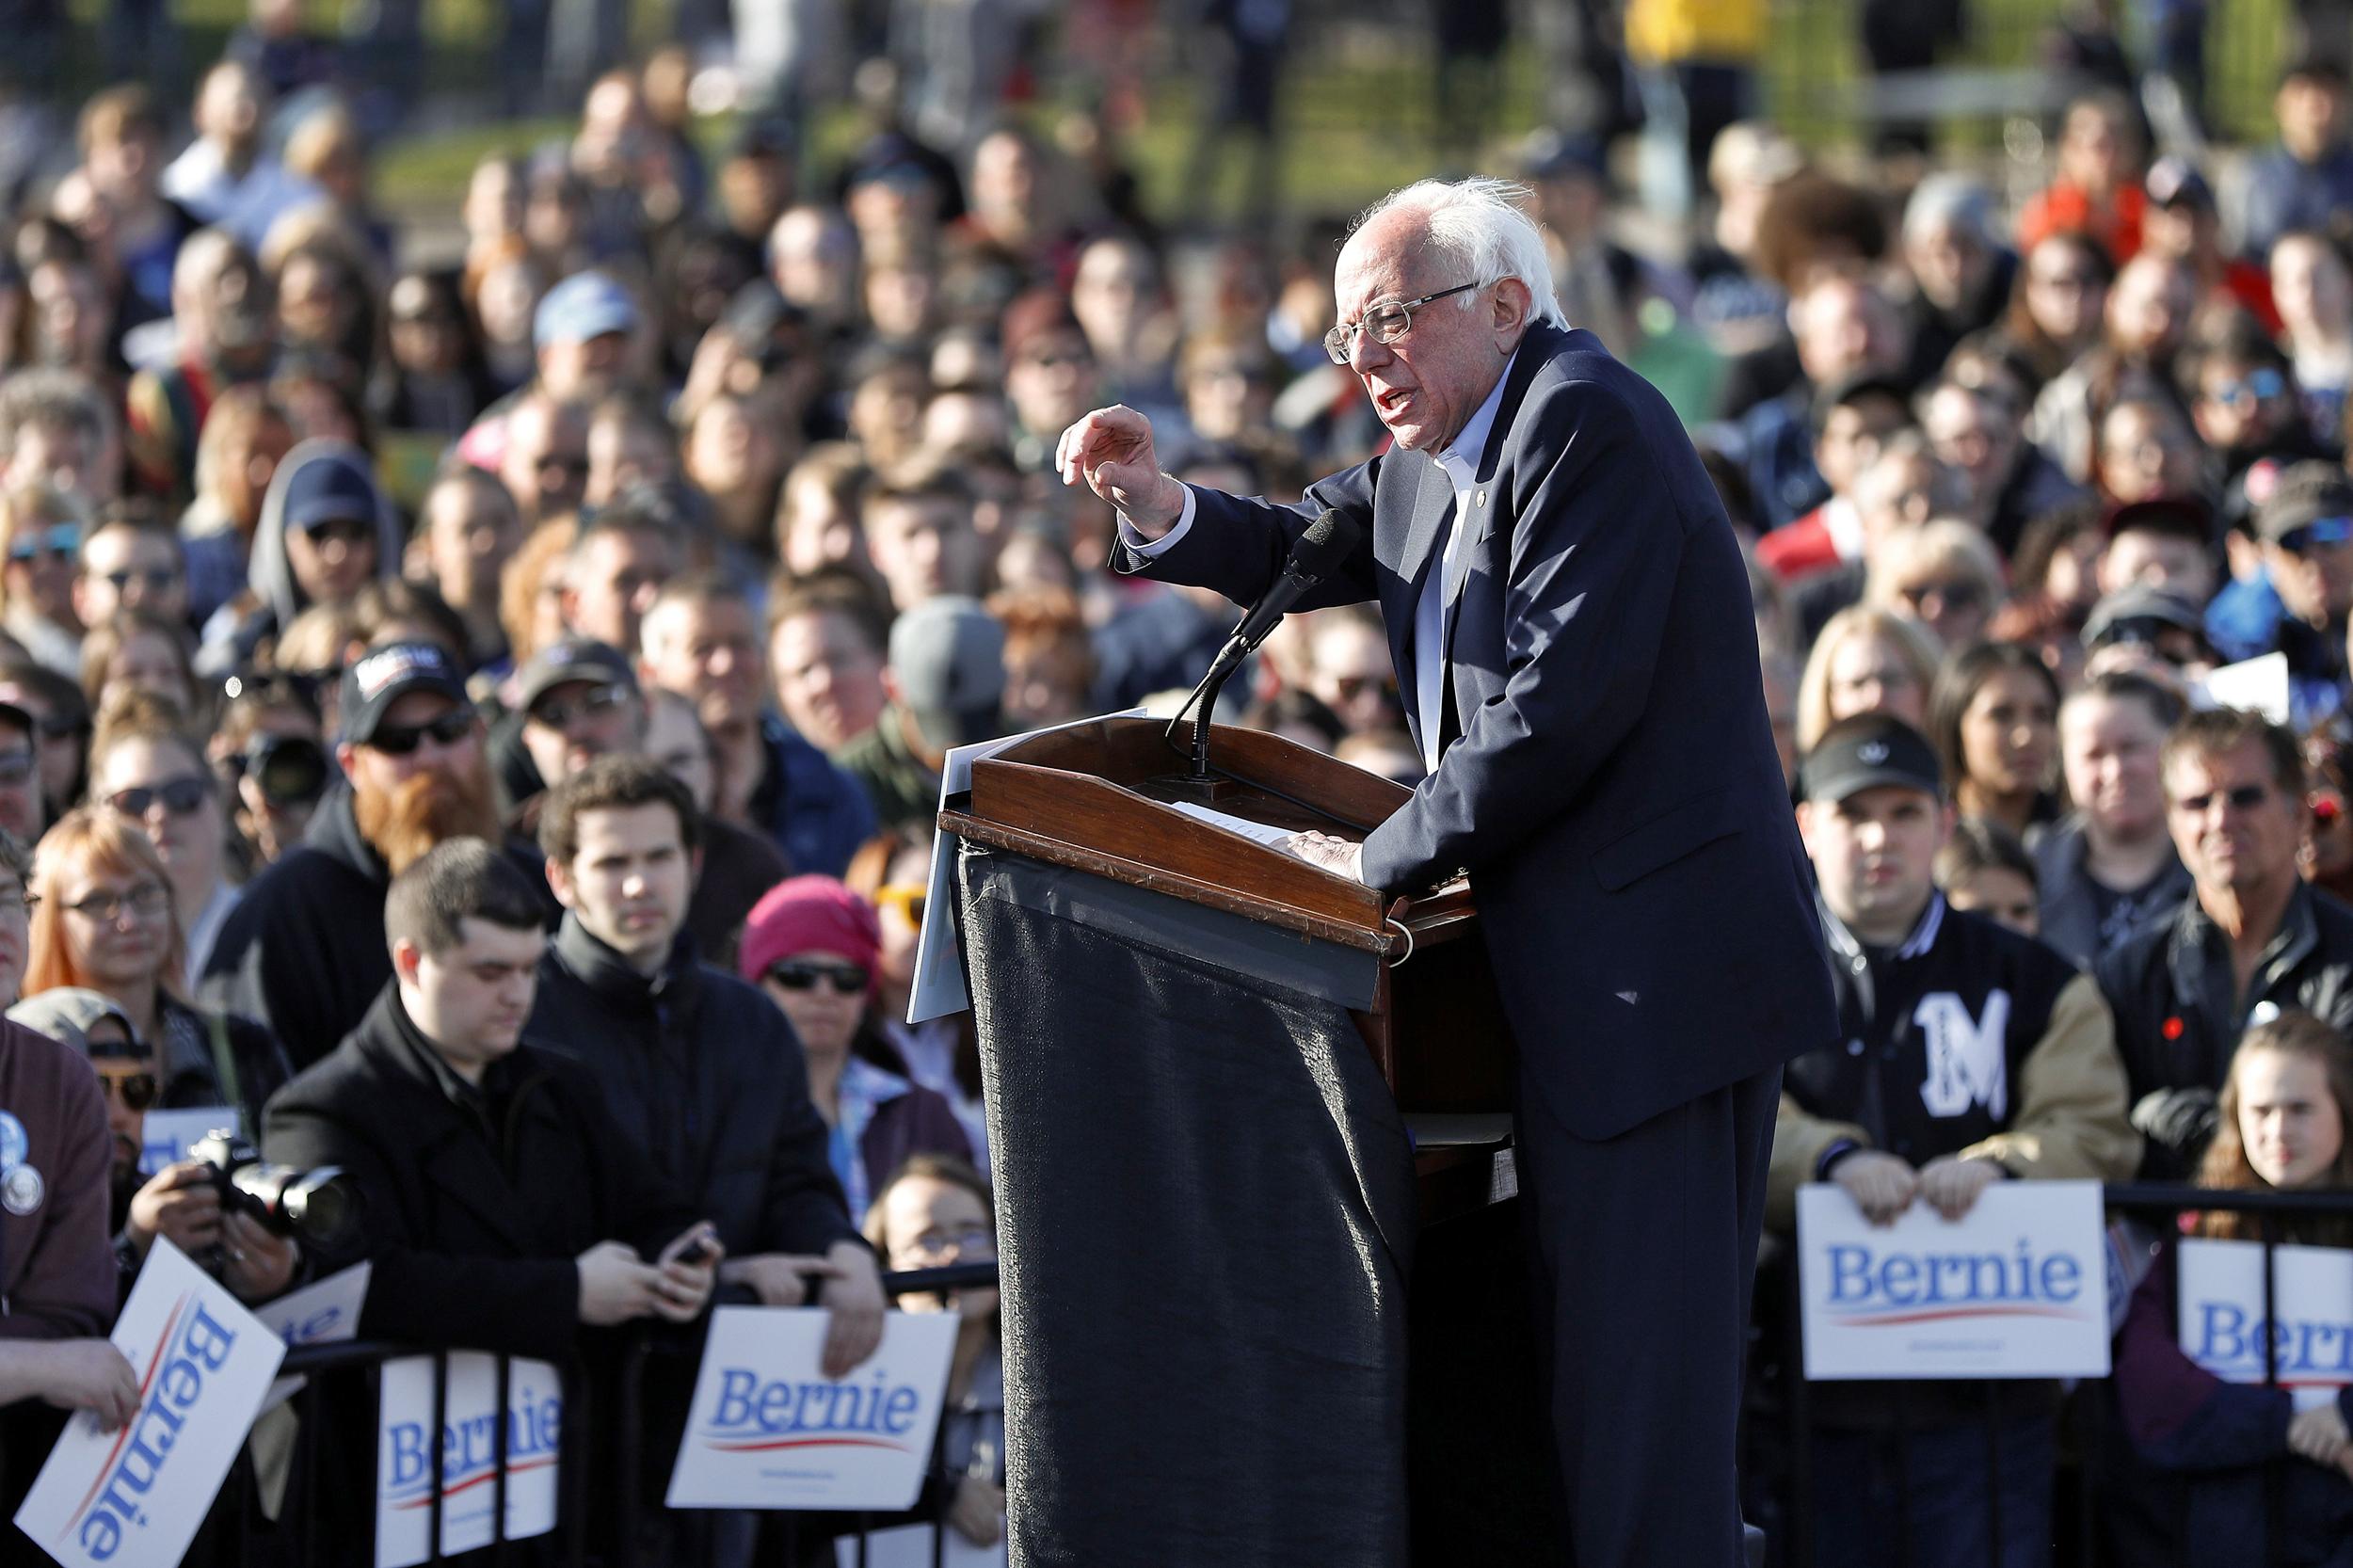 Bernie Sanders speaking behind a podium at a rally